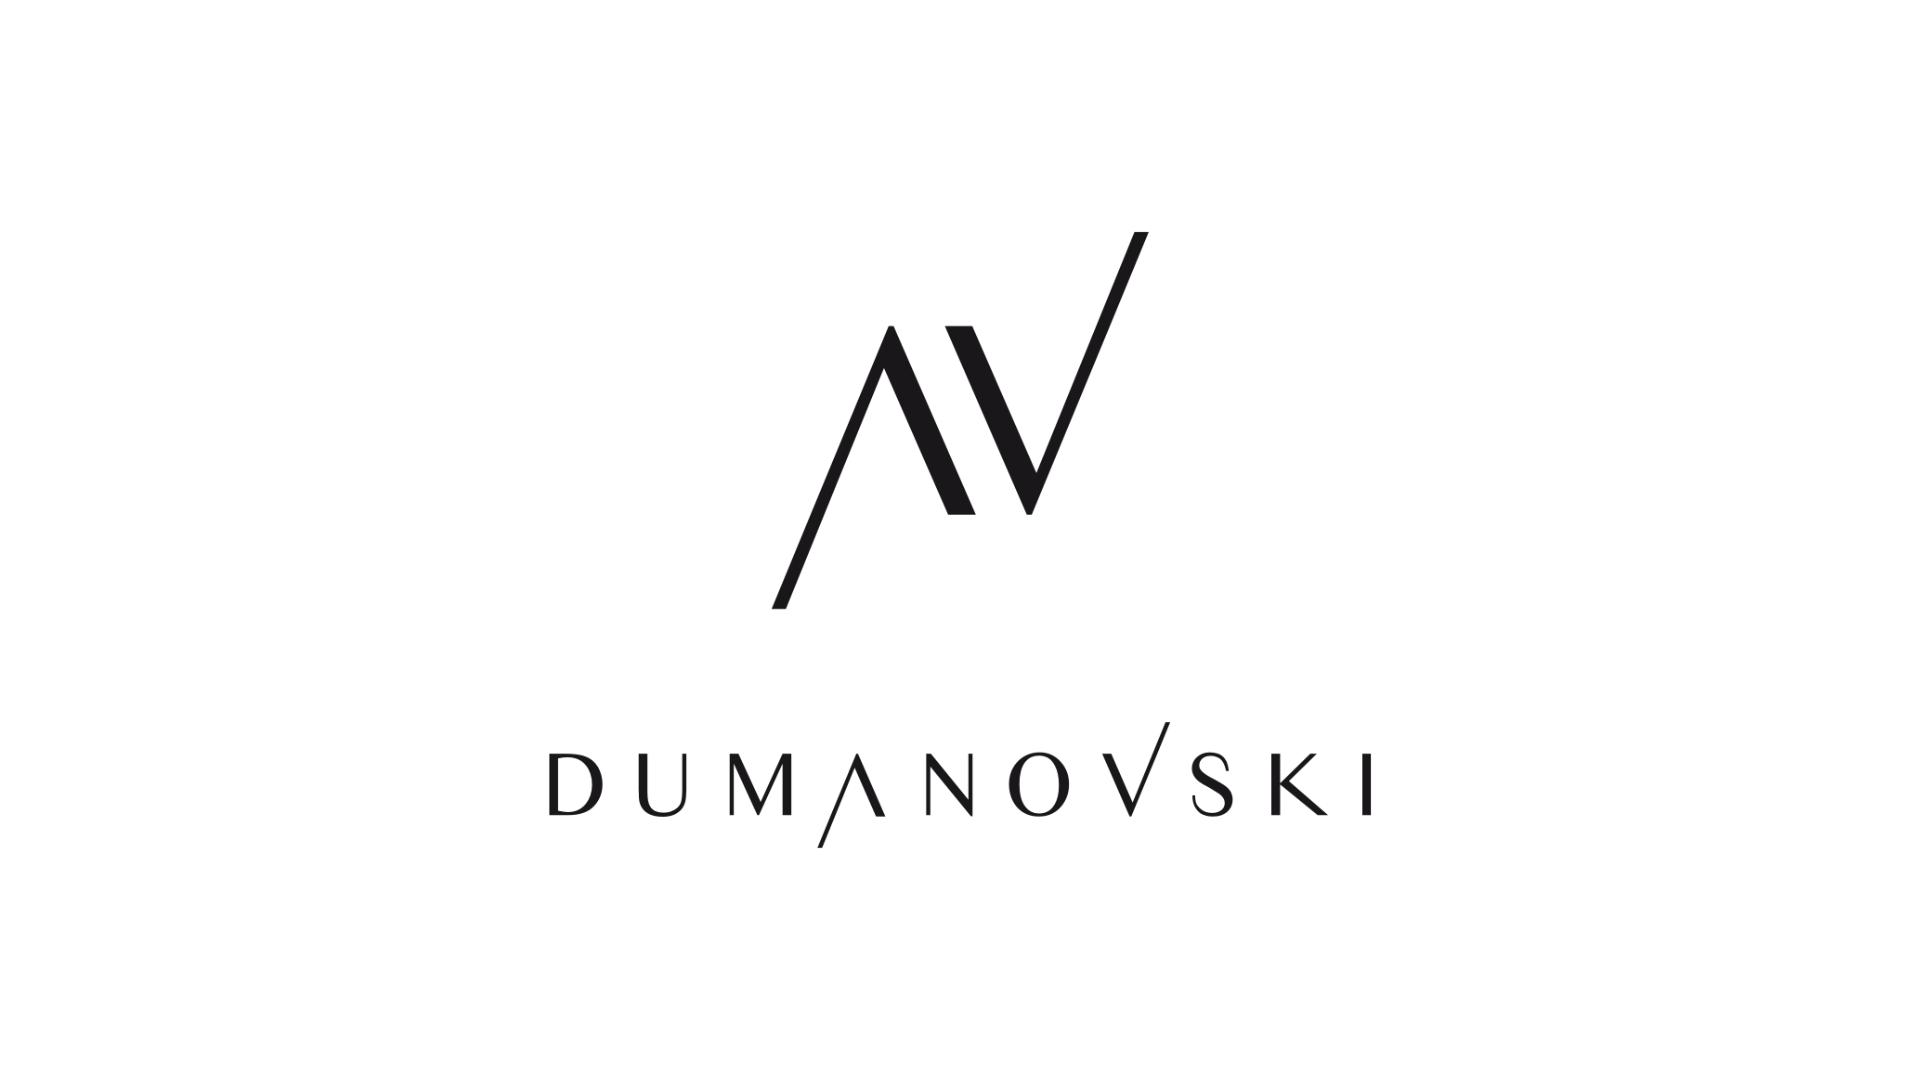 DUMANOVSKI